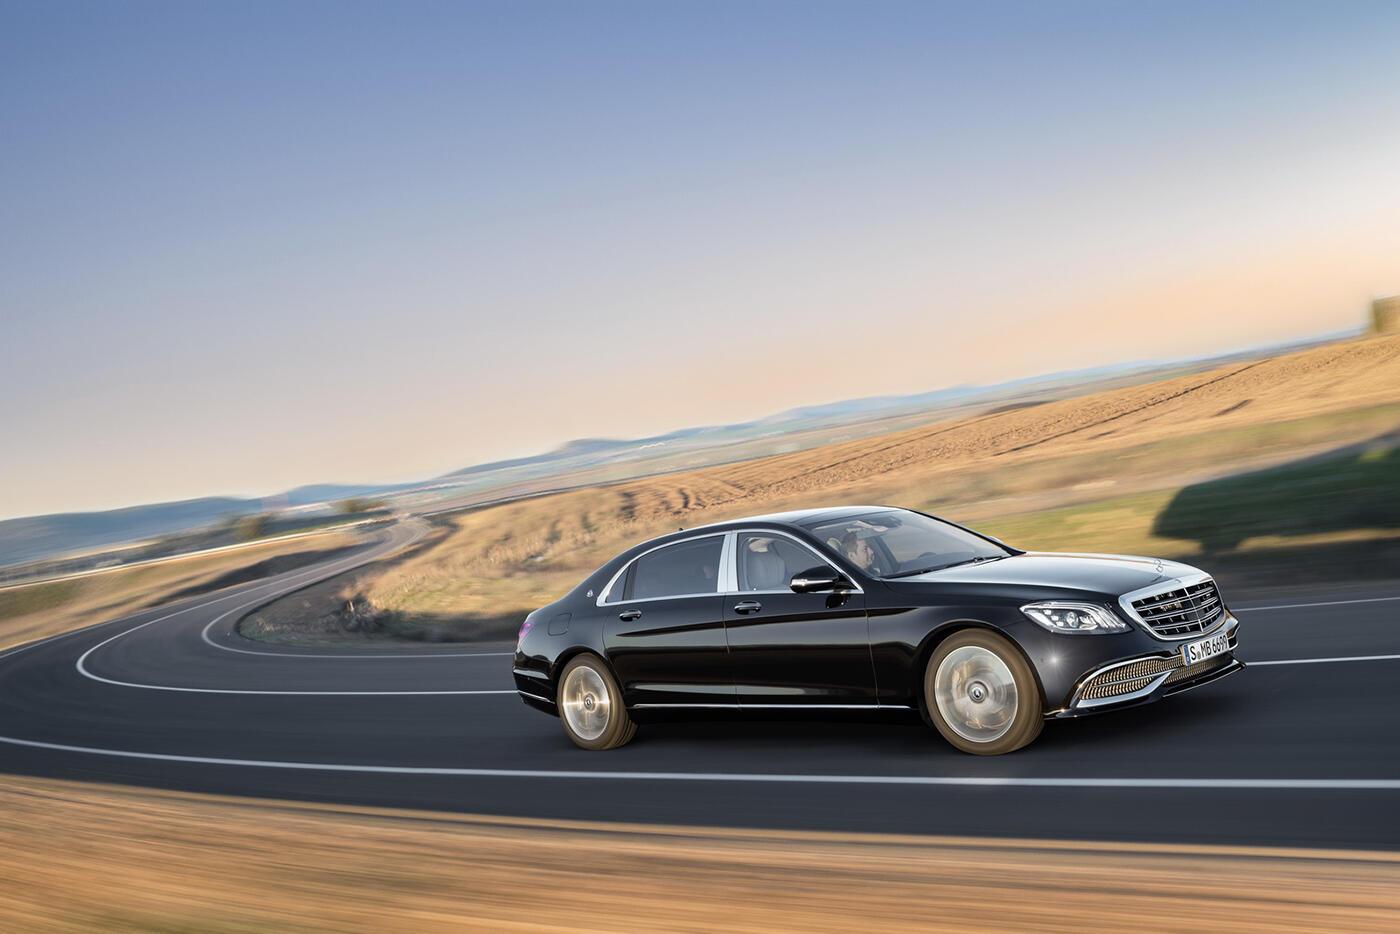 Ảnh chi tiết Mercedes-Benz S-Class 2018 - Hình 2